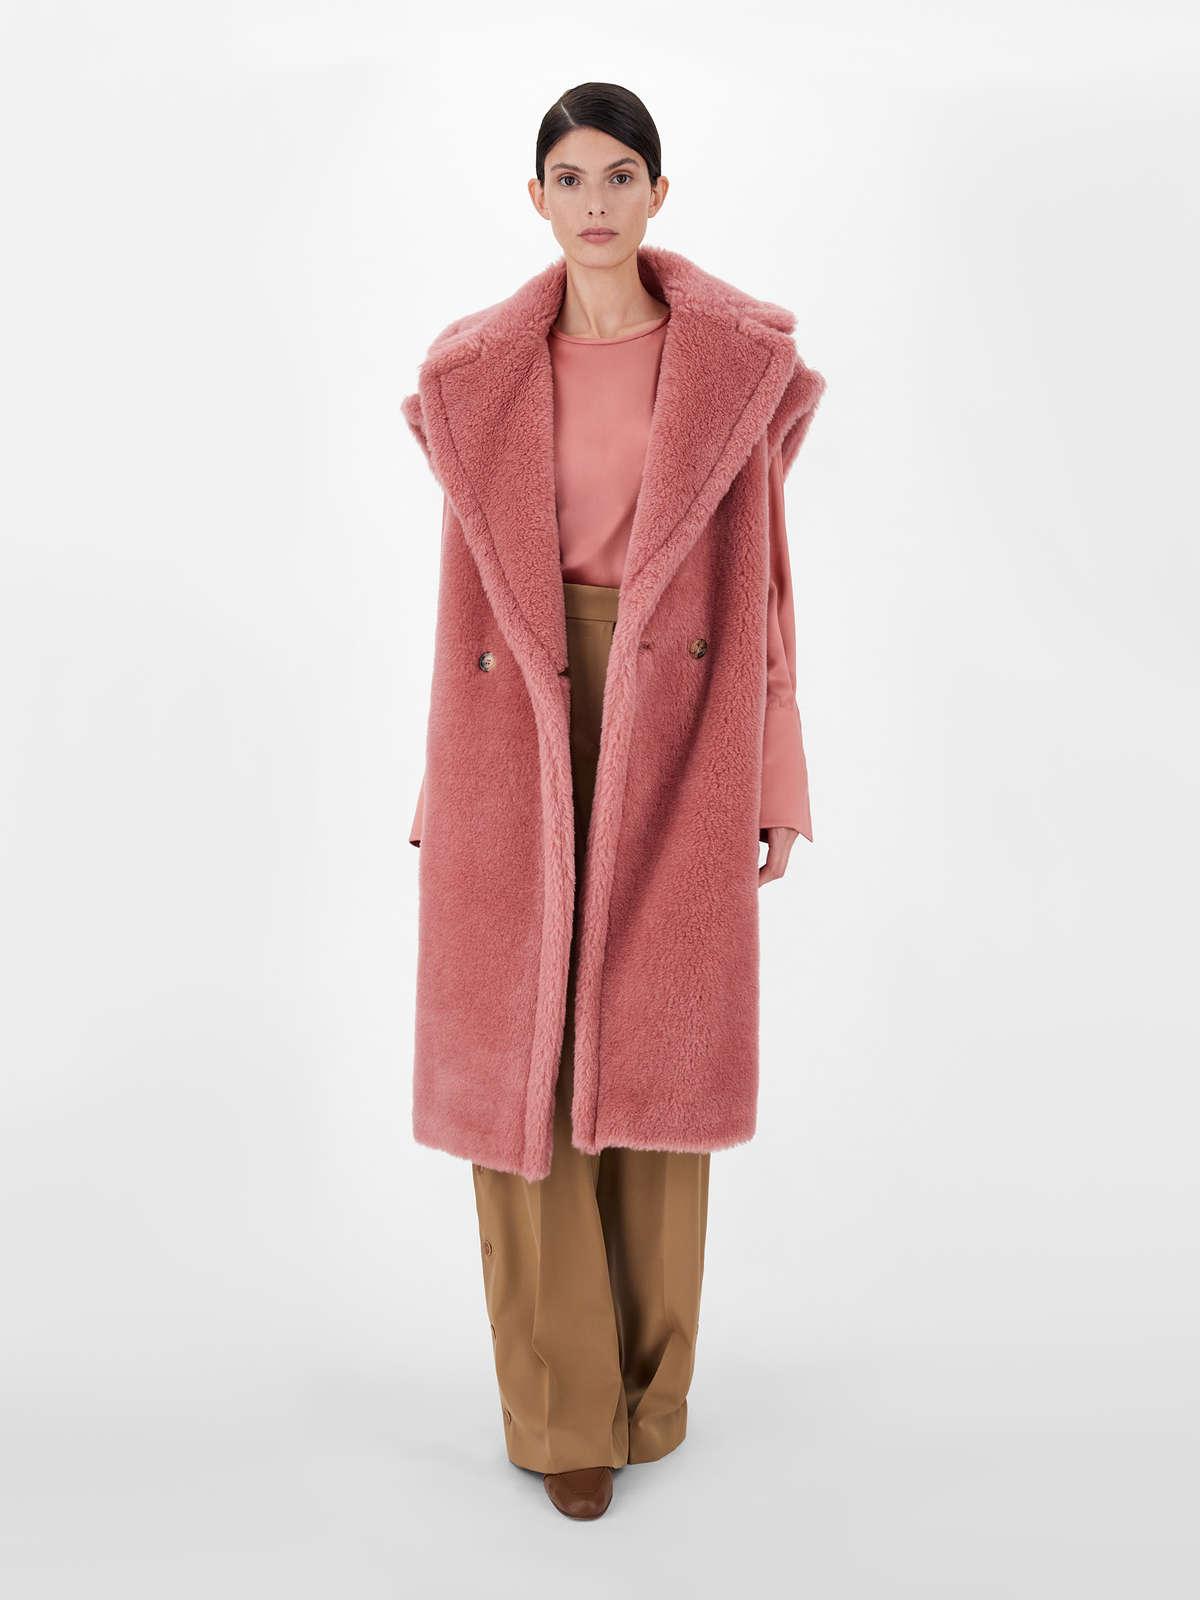 Gilet Teddy in alpaca e lana - Max Mara